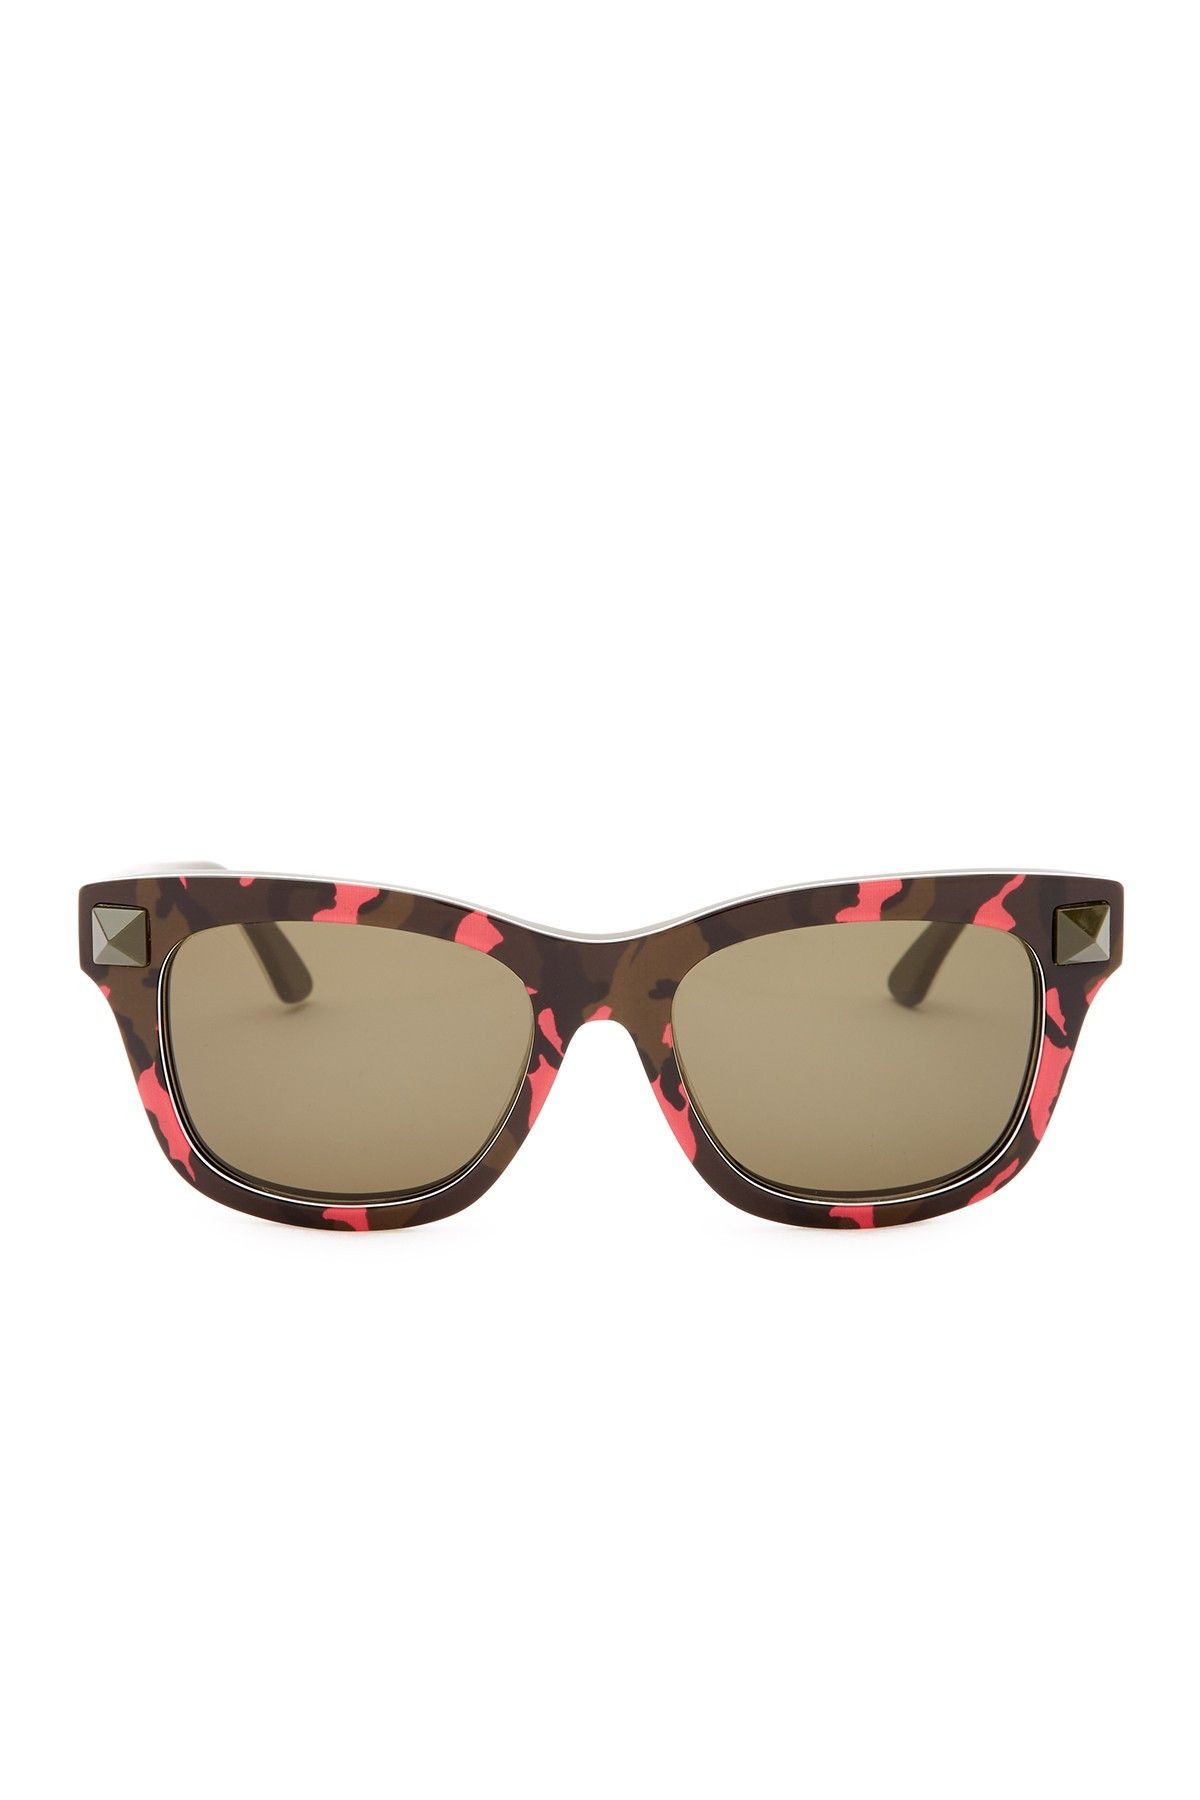 Women's Rockstud Camo Wayfarer Sunglasses